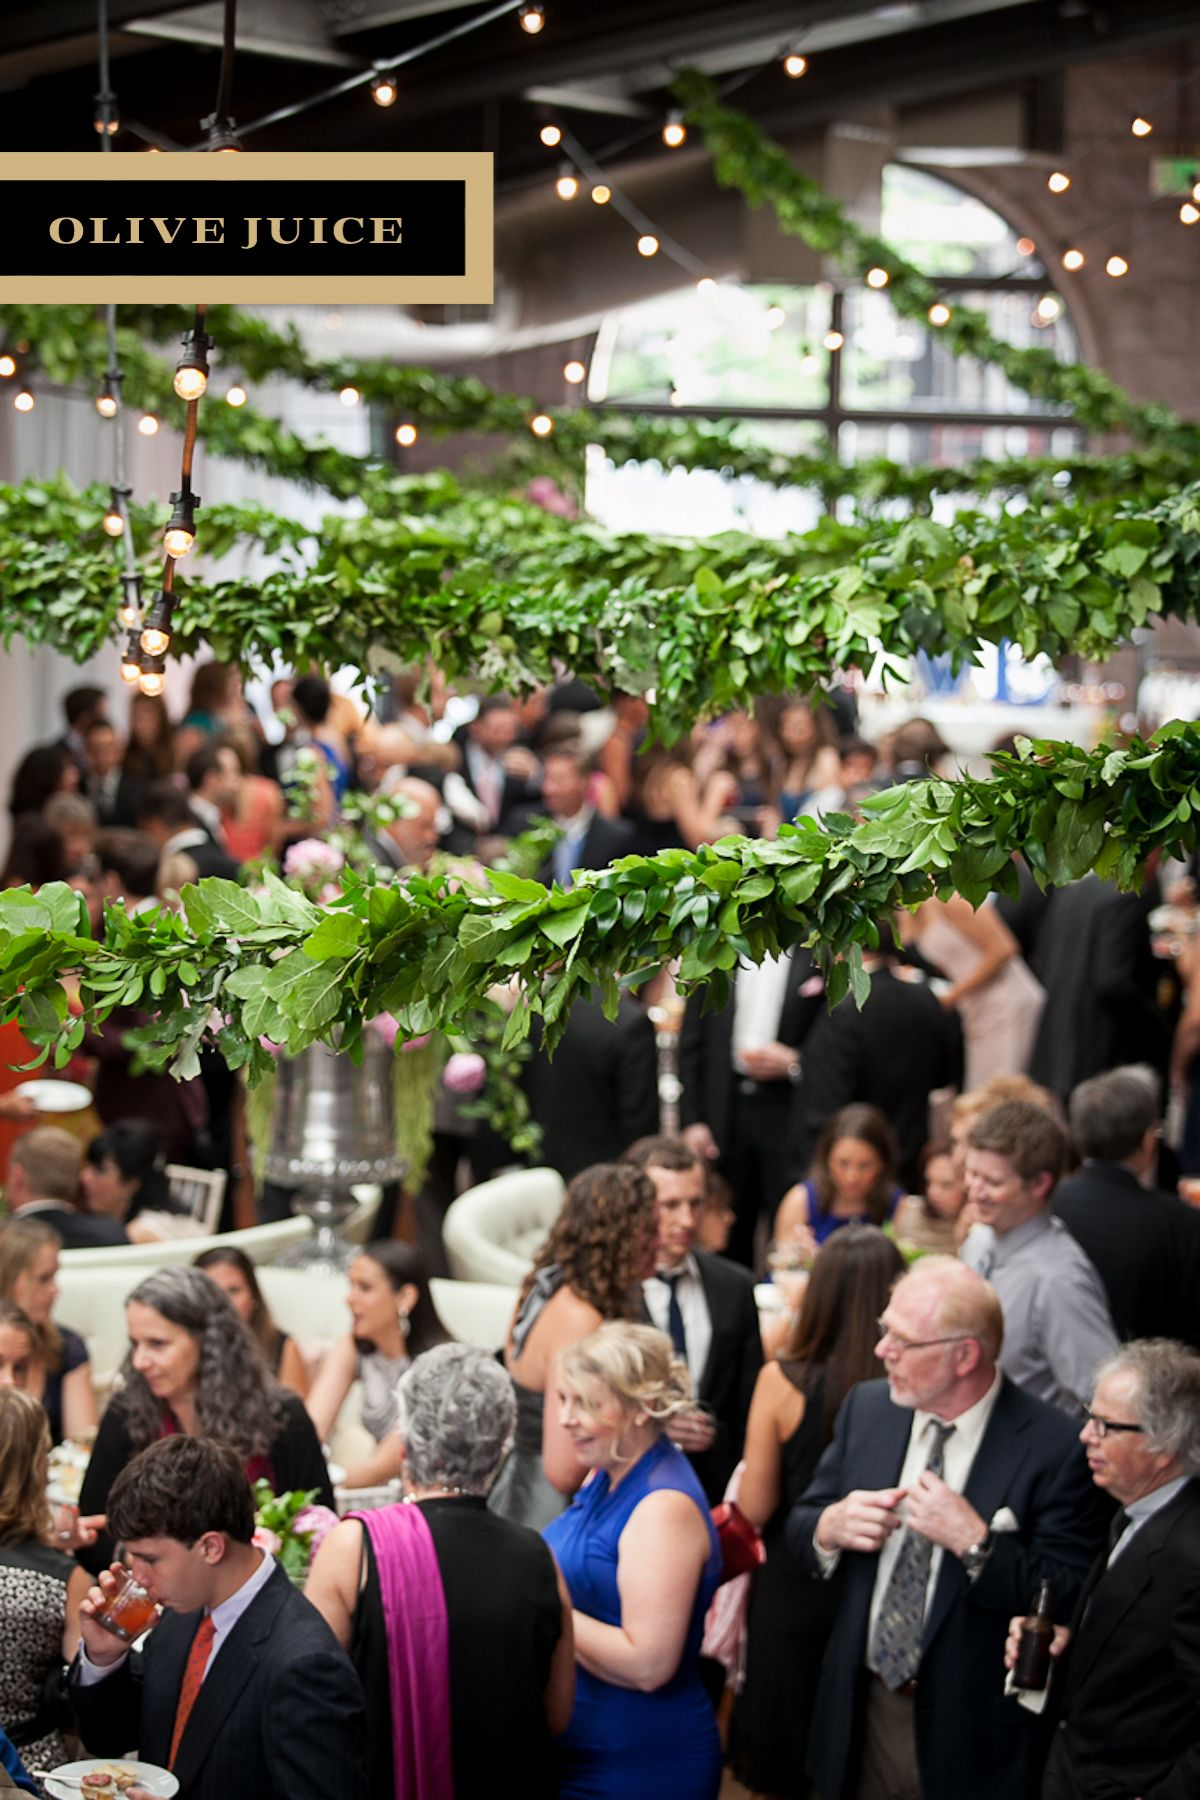 olive juice studios wedding reception in the winter garden the